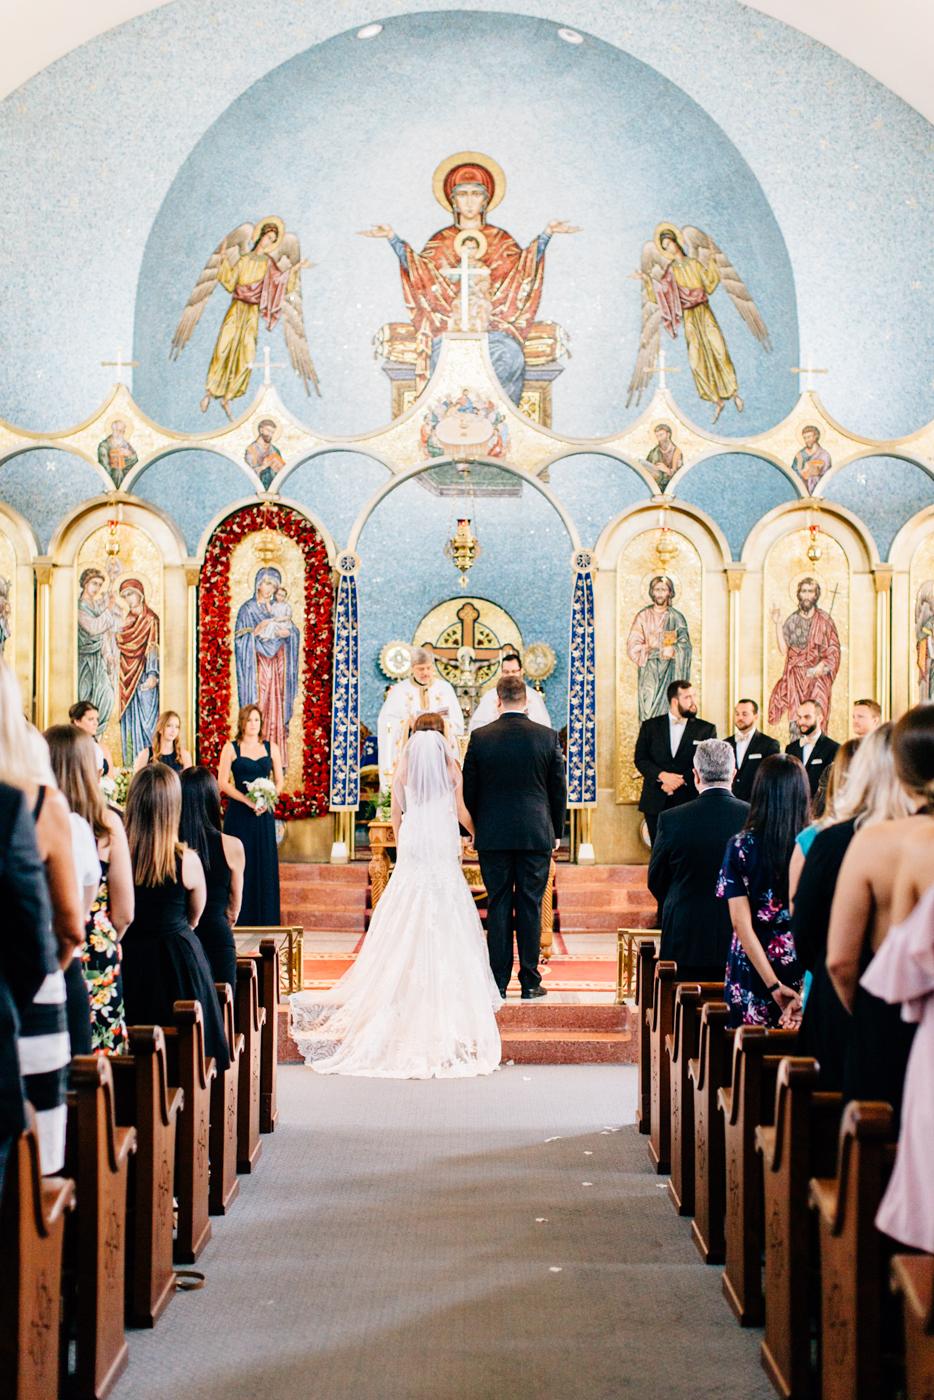 four corners photography greek wedding atlanta greek wedding photographer Annunciation Greek Orthodox Cathedral atlanta wedding photographer (22 of 69).jpg